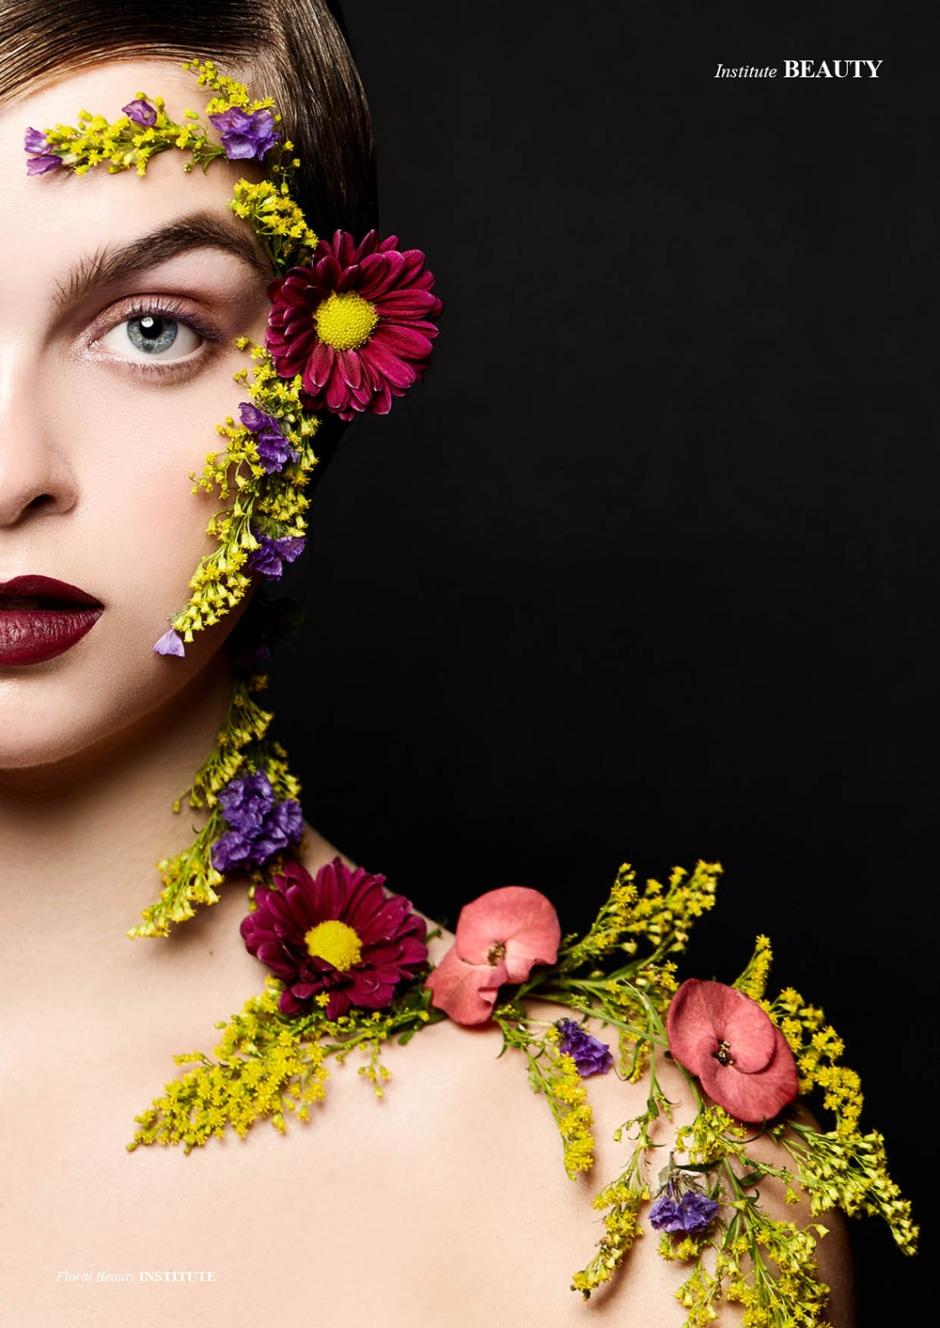 floral-beauty-single